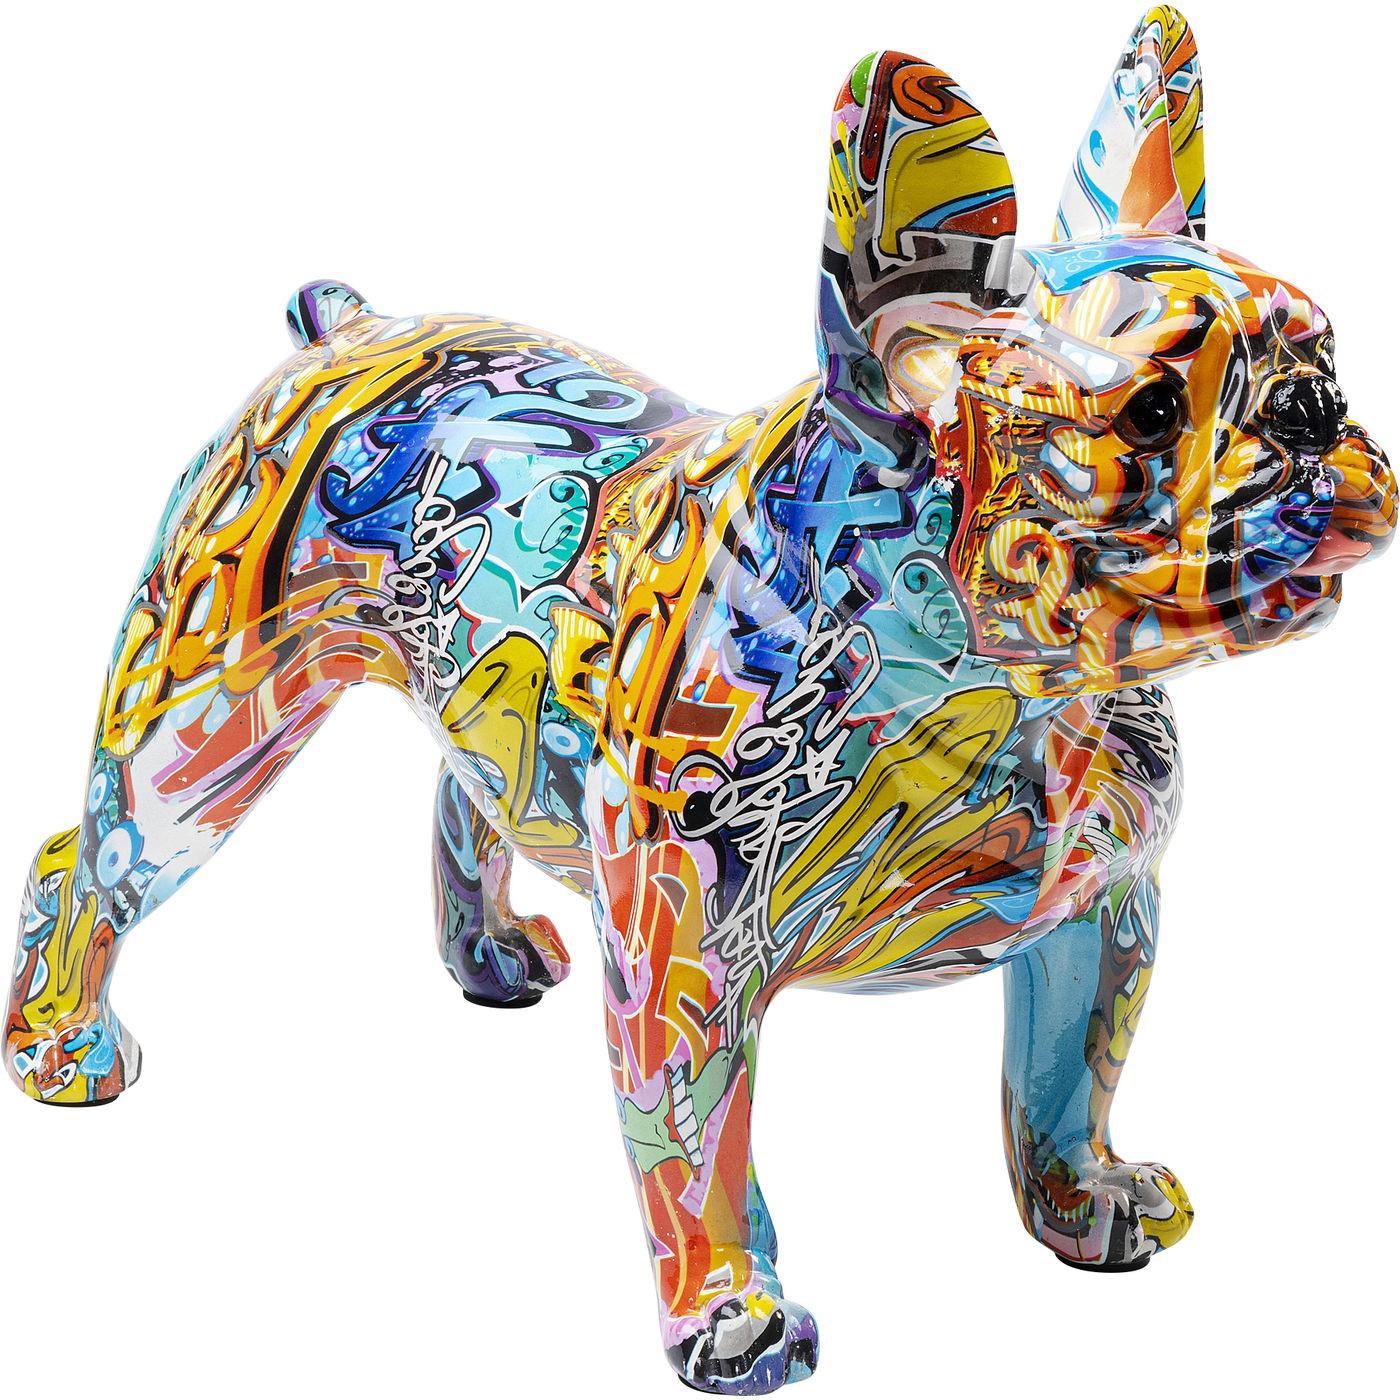 Déco Bulldog graffiti jaune Kare Design